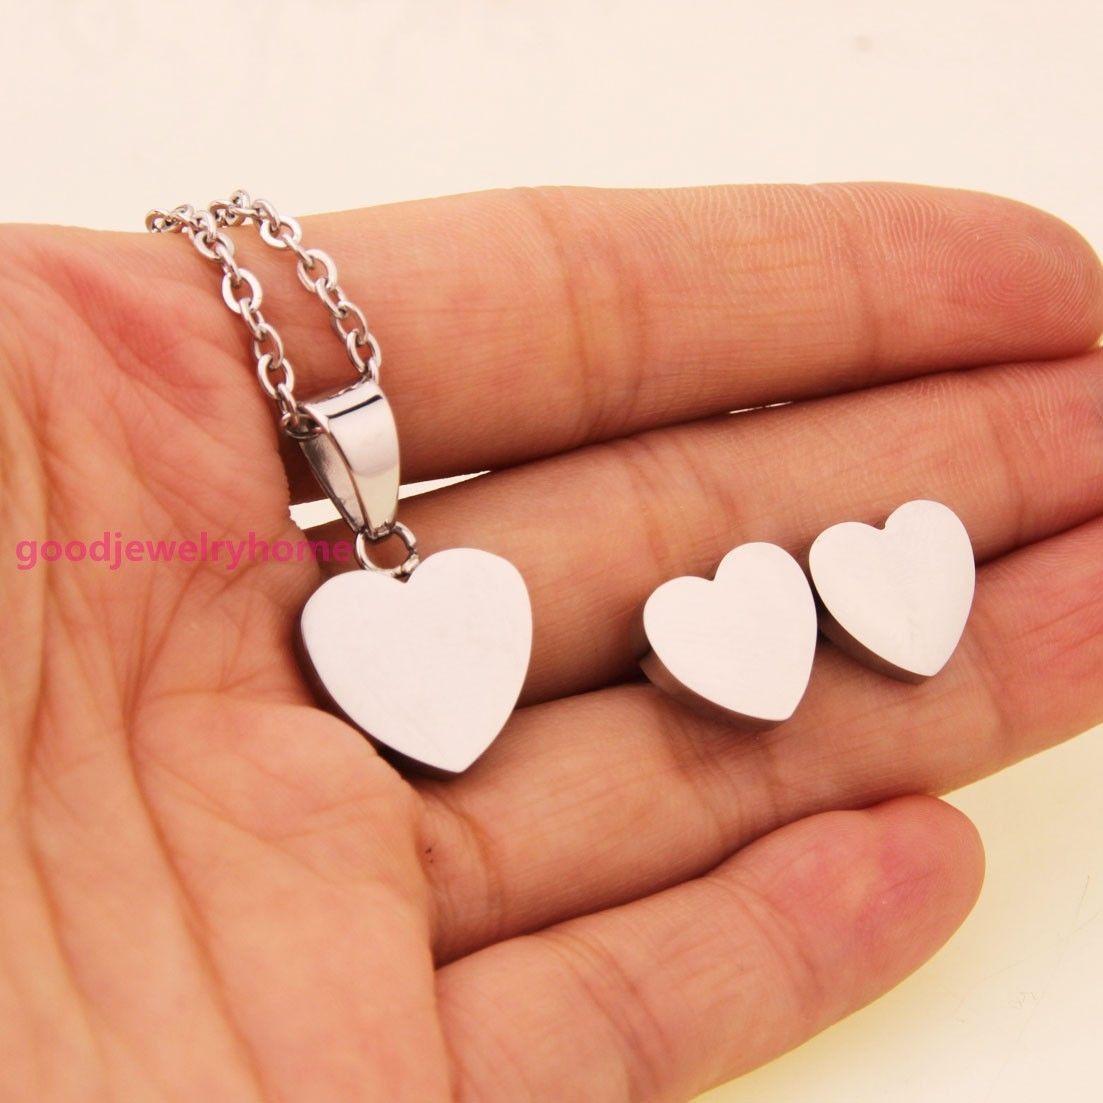 New womenus stainless steel silver heart pendant necklace earrings